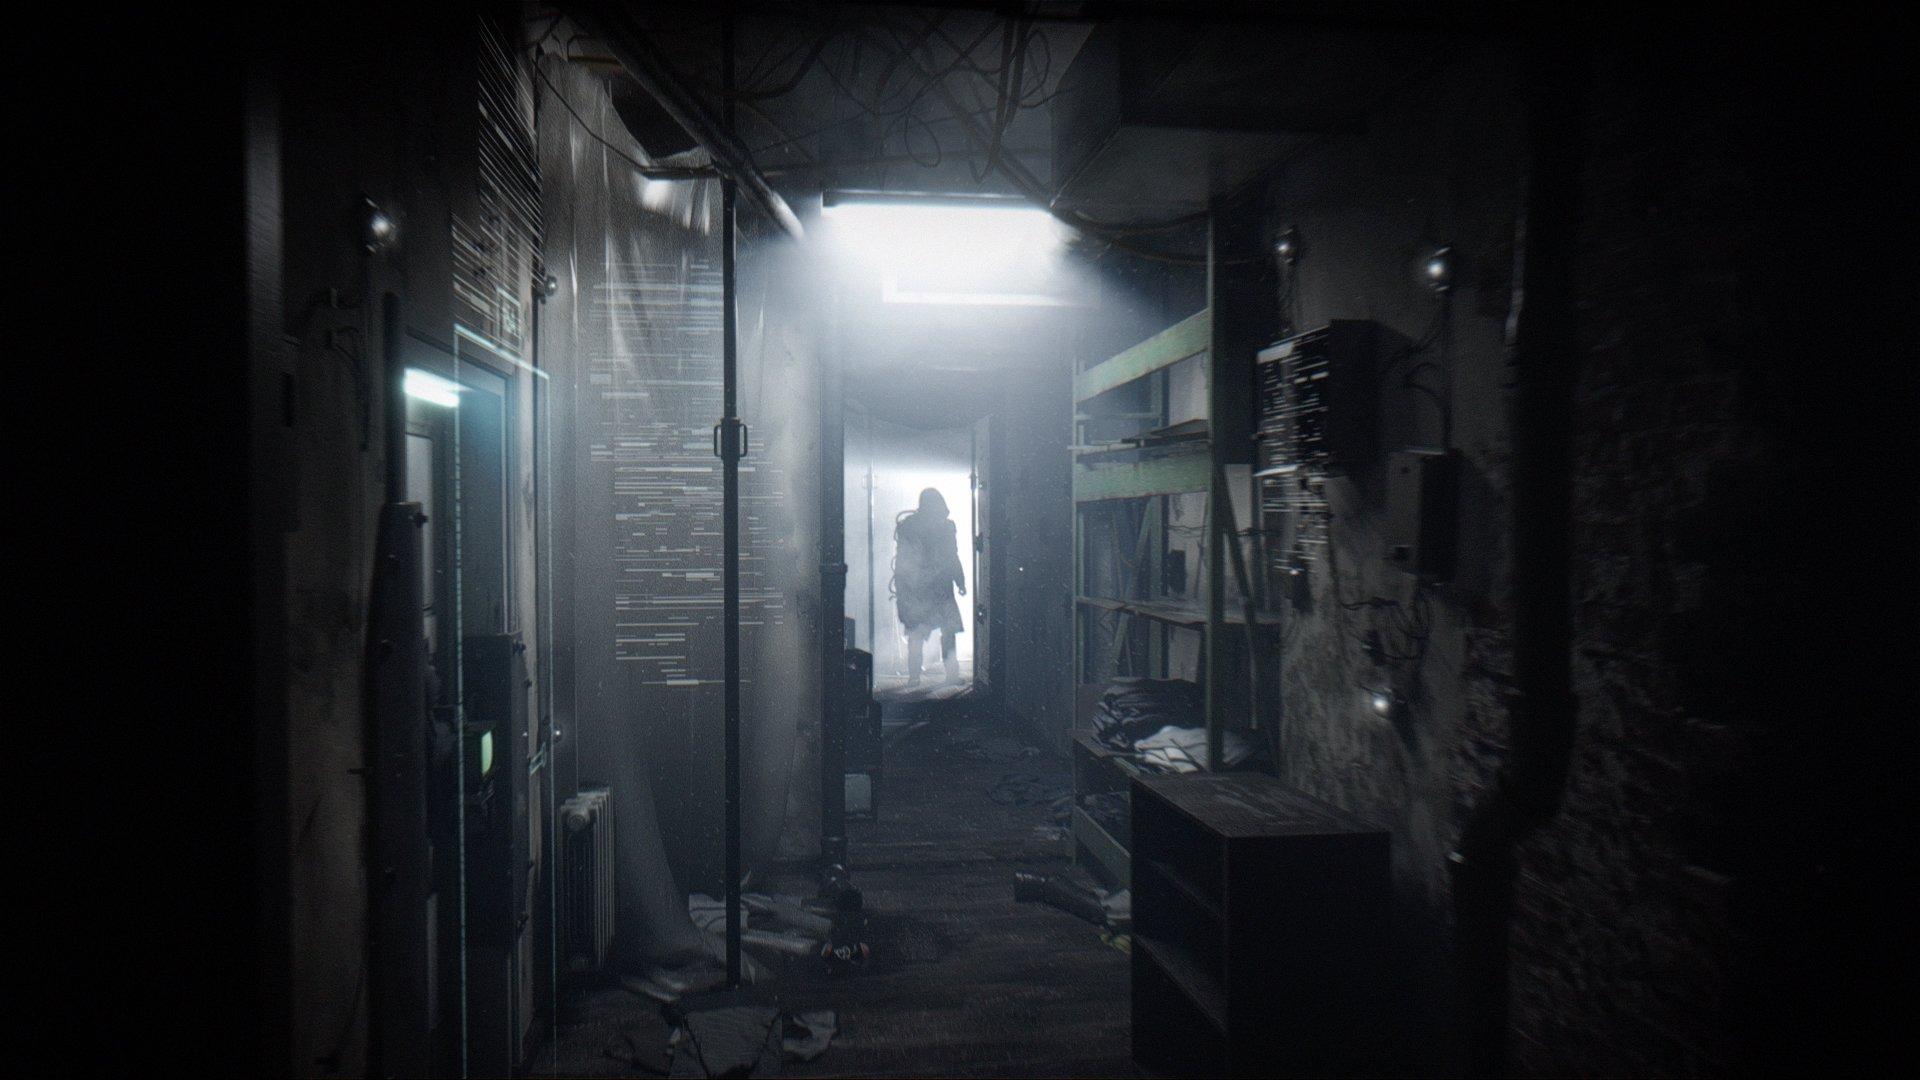 Observer Xbox Intense Horror Game Set In